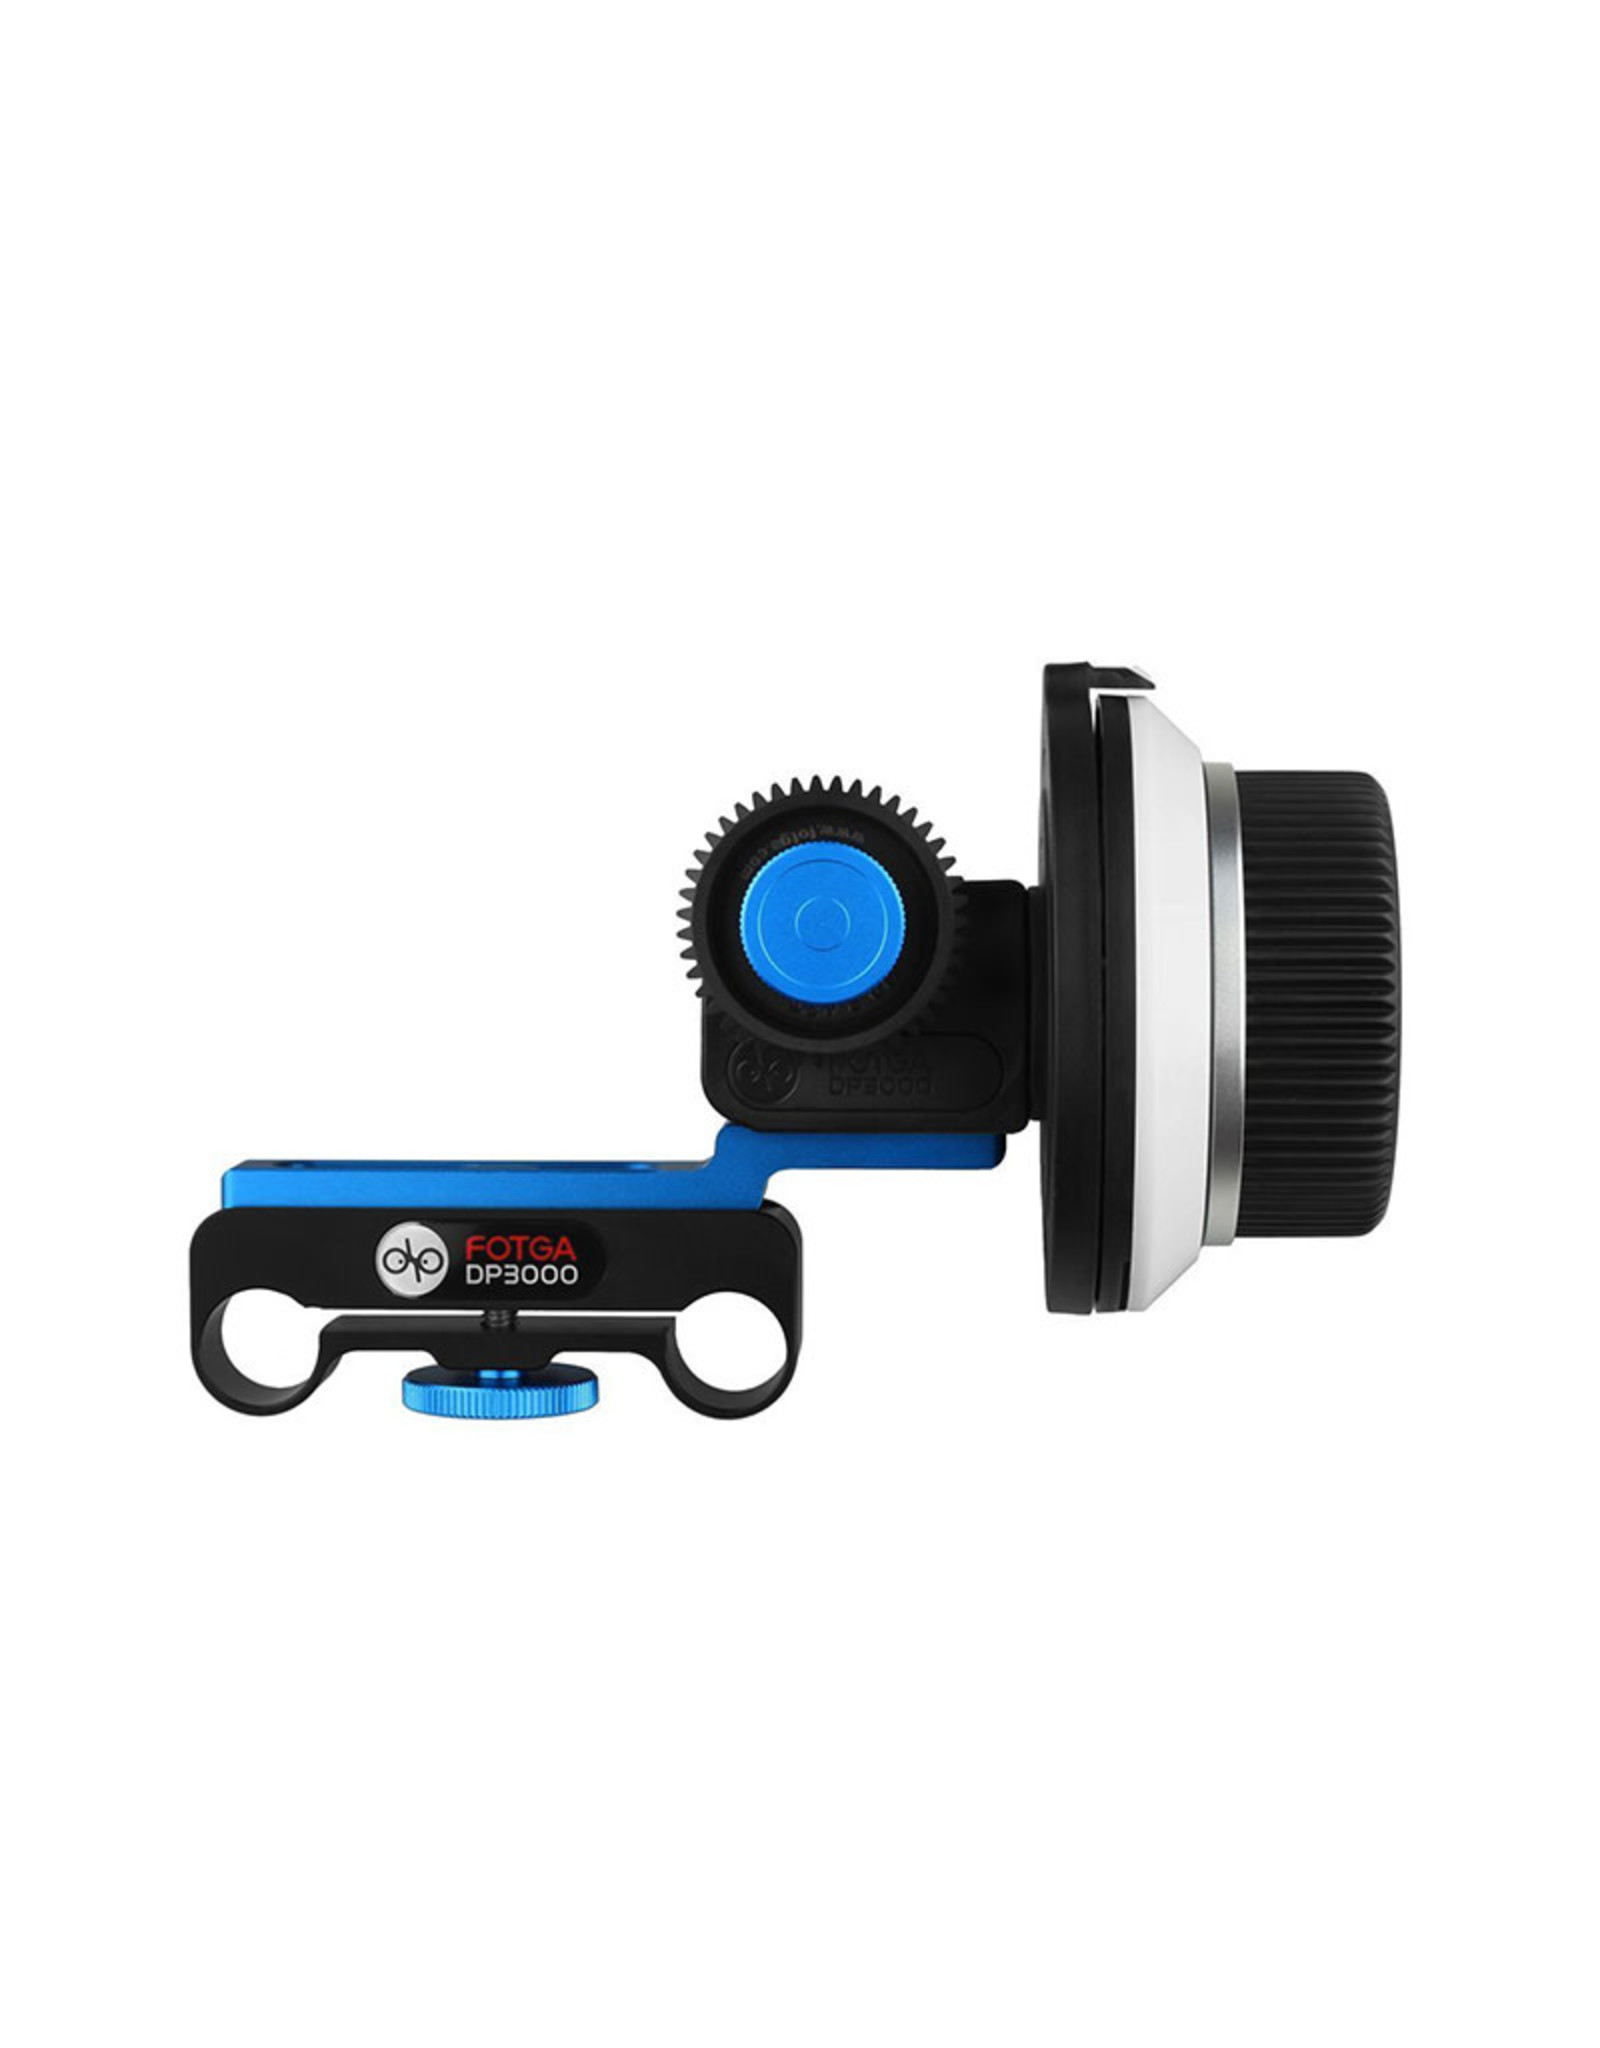 FOTGA FOTGA DP3000 M1 DSLR Follow Focus with Flexible Gear Belt for 15mm Rail Rod Rig